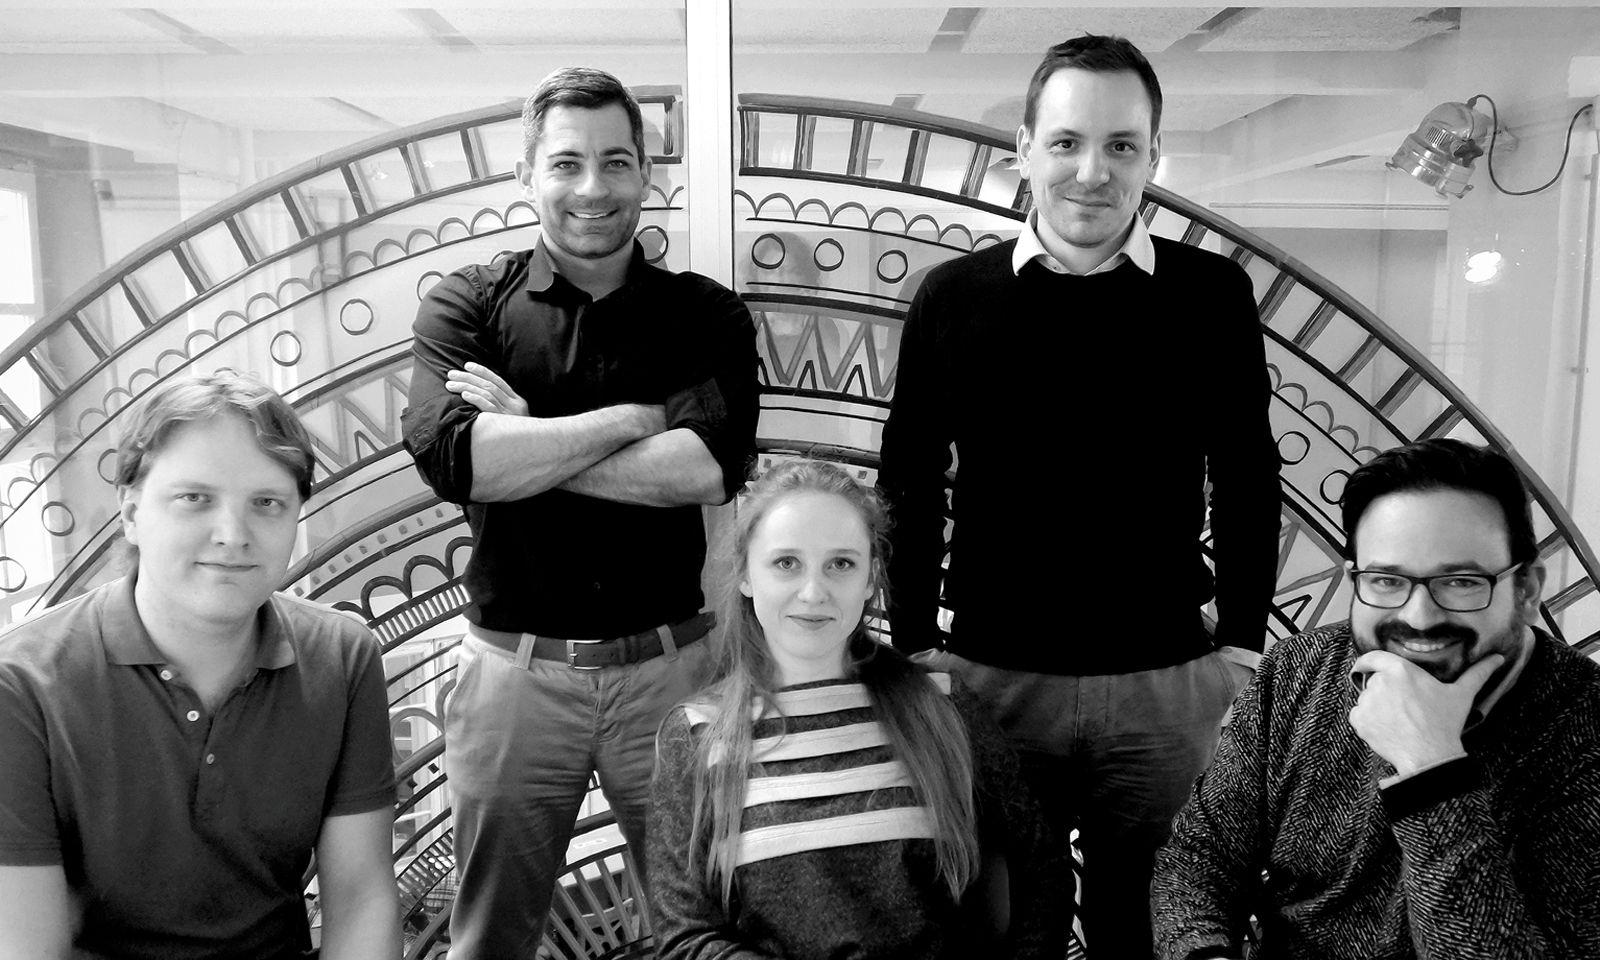 Know-how. Das IFDAQ-Team hat große Ziele. V.l.n.r.: Raimund Homann, Markus Übeleis, Iva Mirbach, Daryl de Jori, Fréderic Godart. www.ifdaq.com